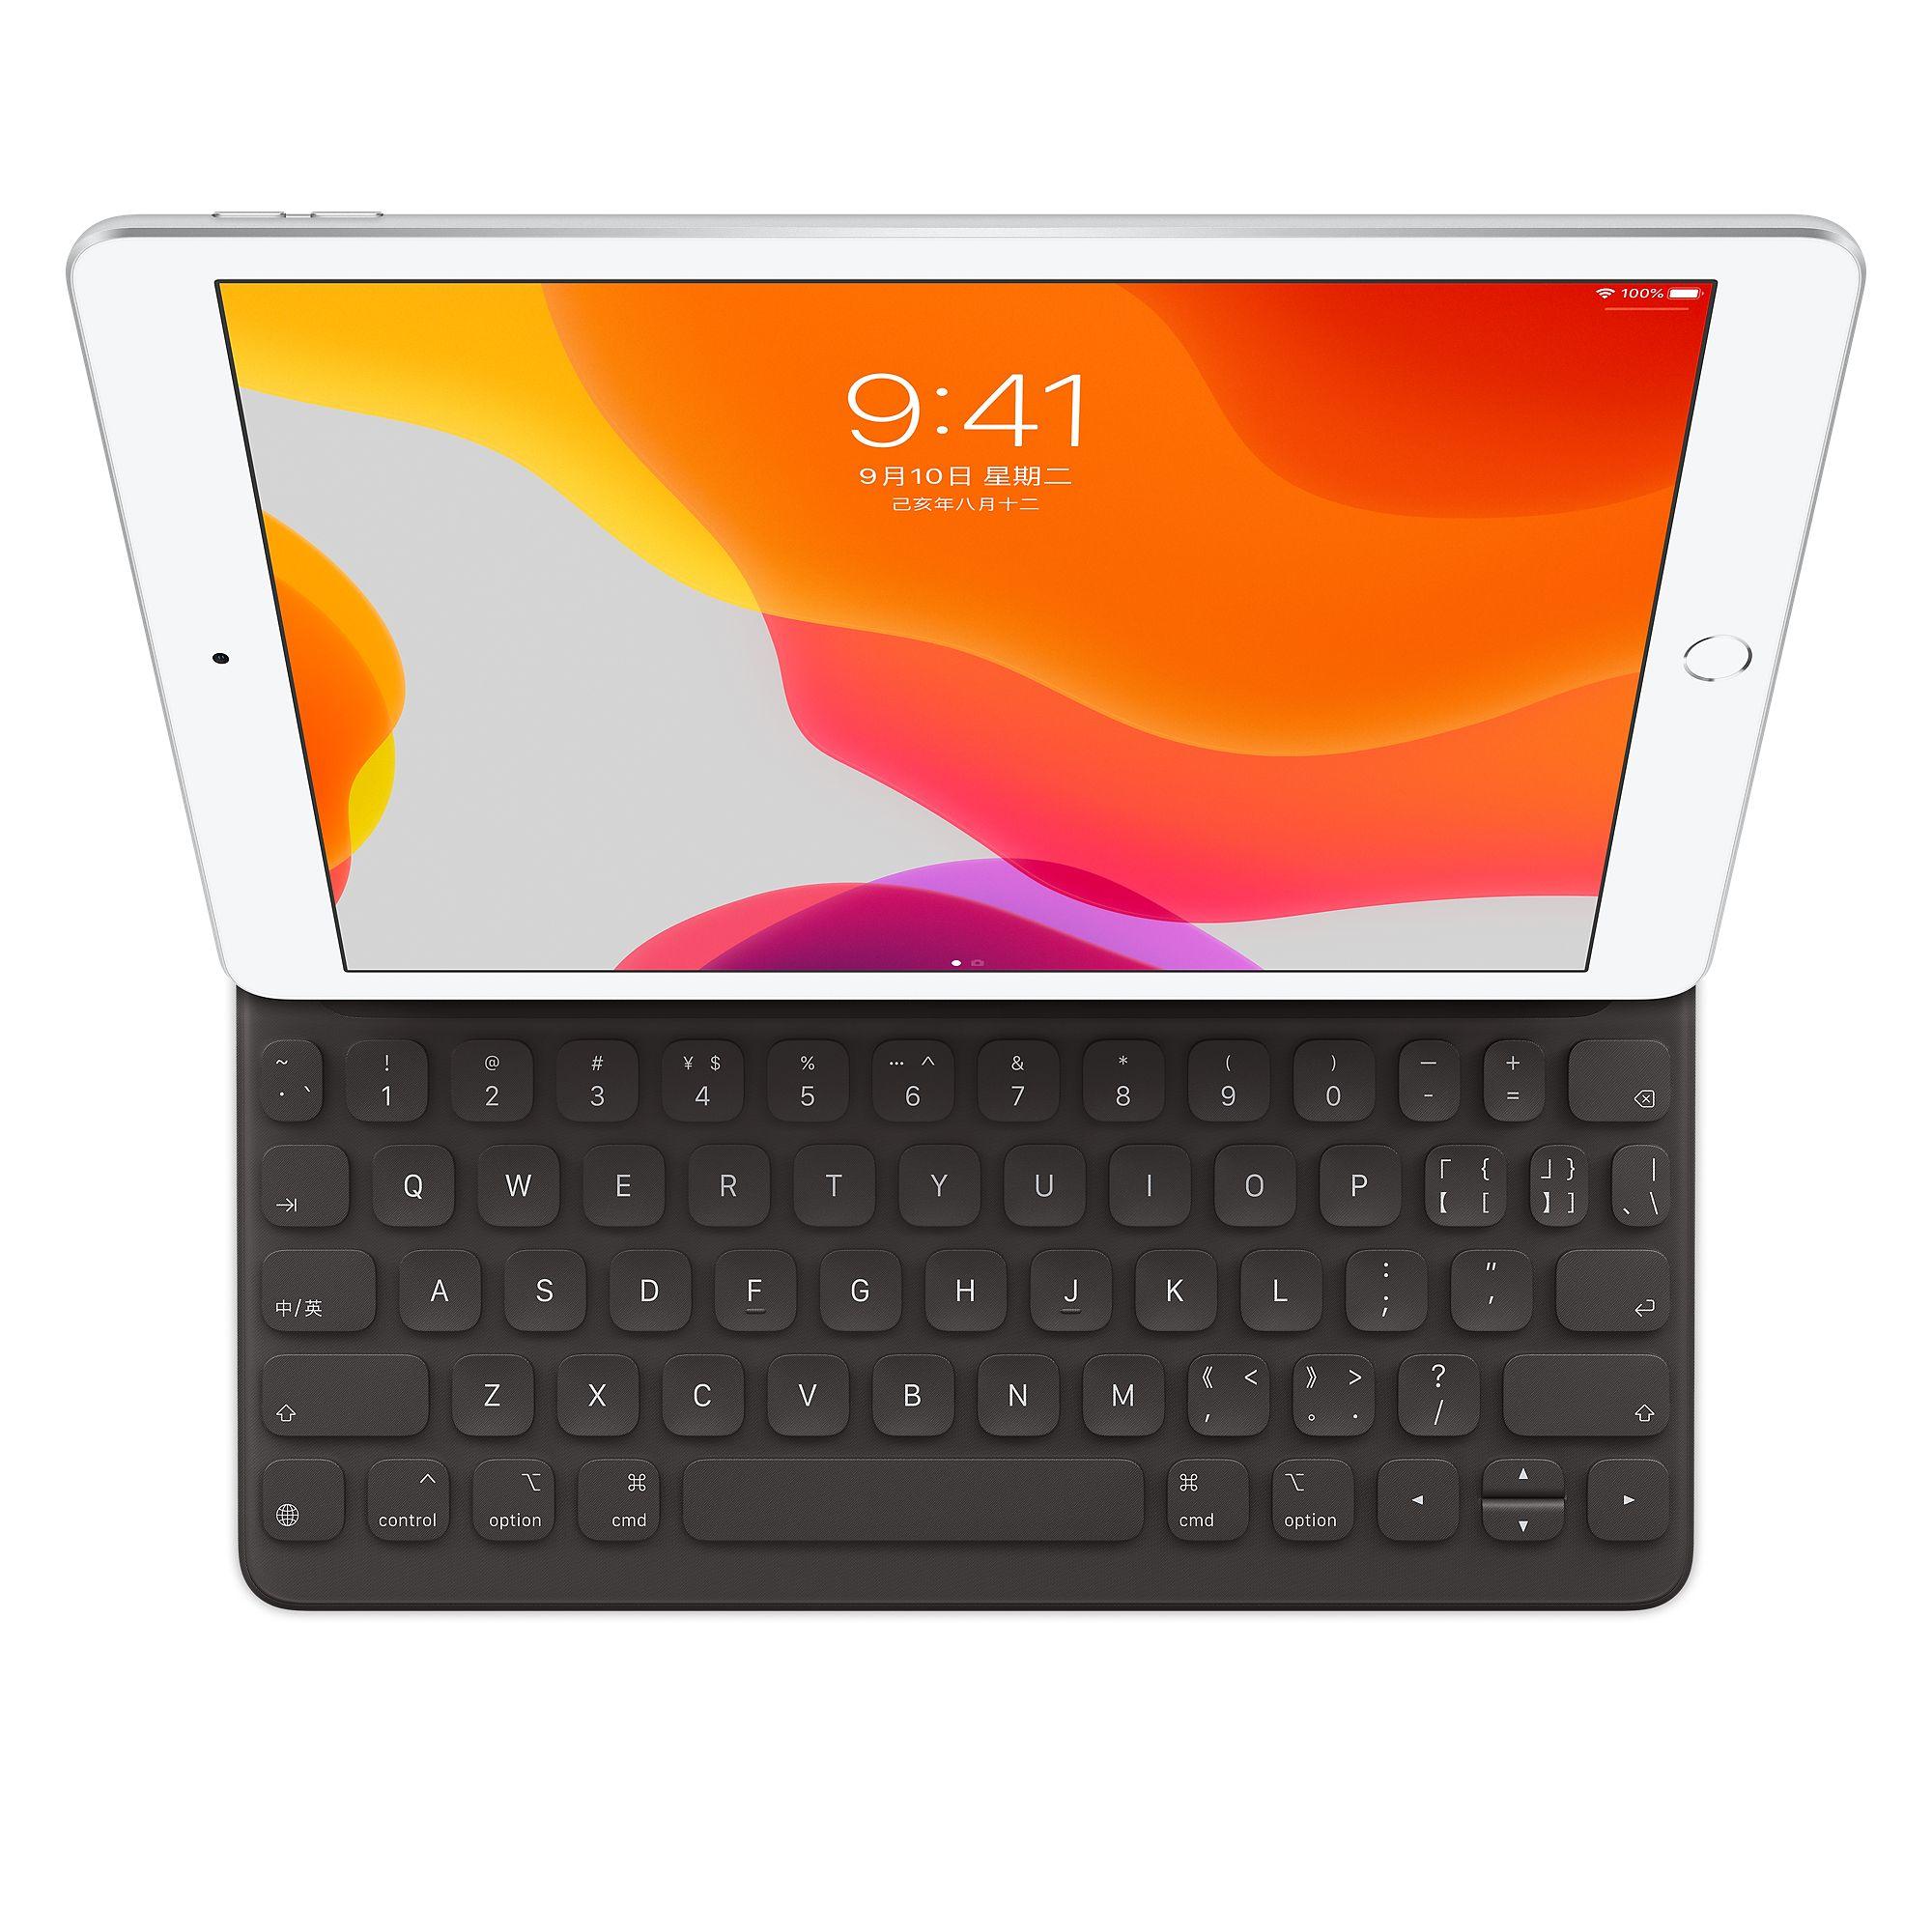 Apple 정품 Smart Keyboard, 중문 자판